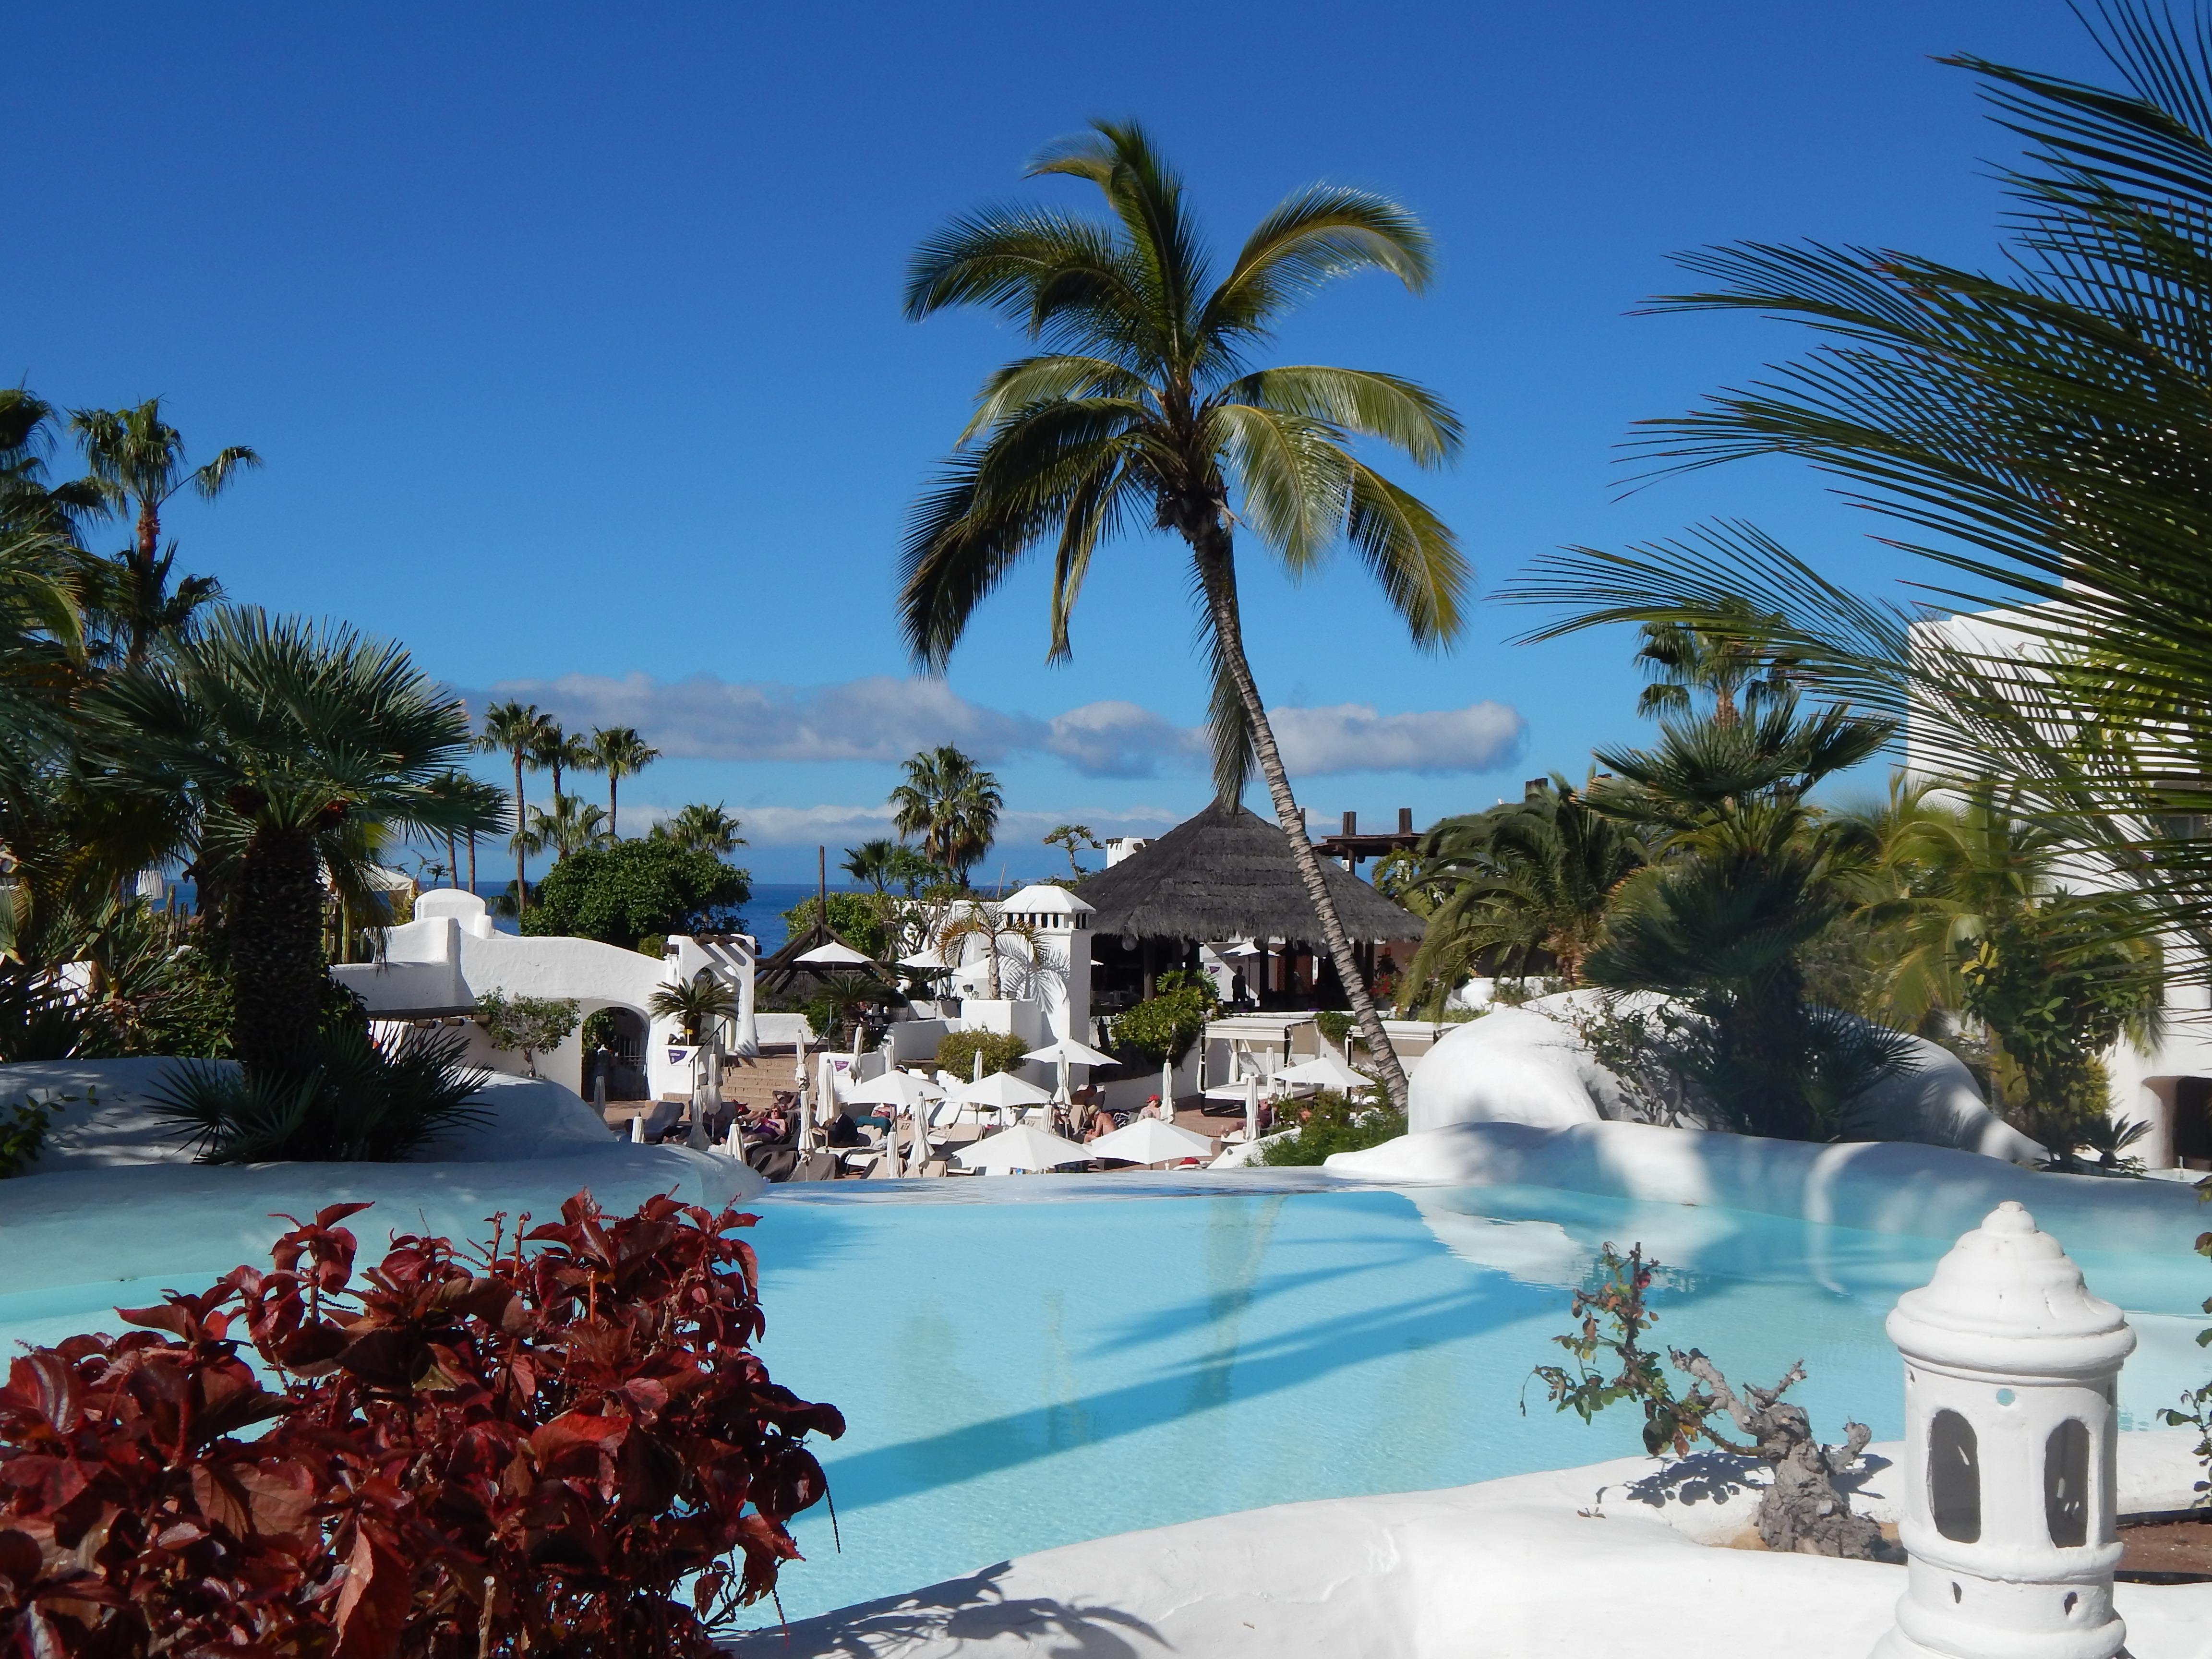 Sejour Canaries Hotel Jardin Tropical 4 Tenerife